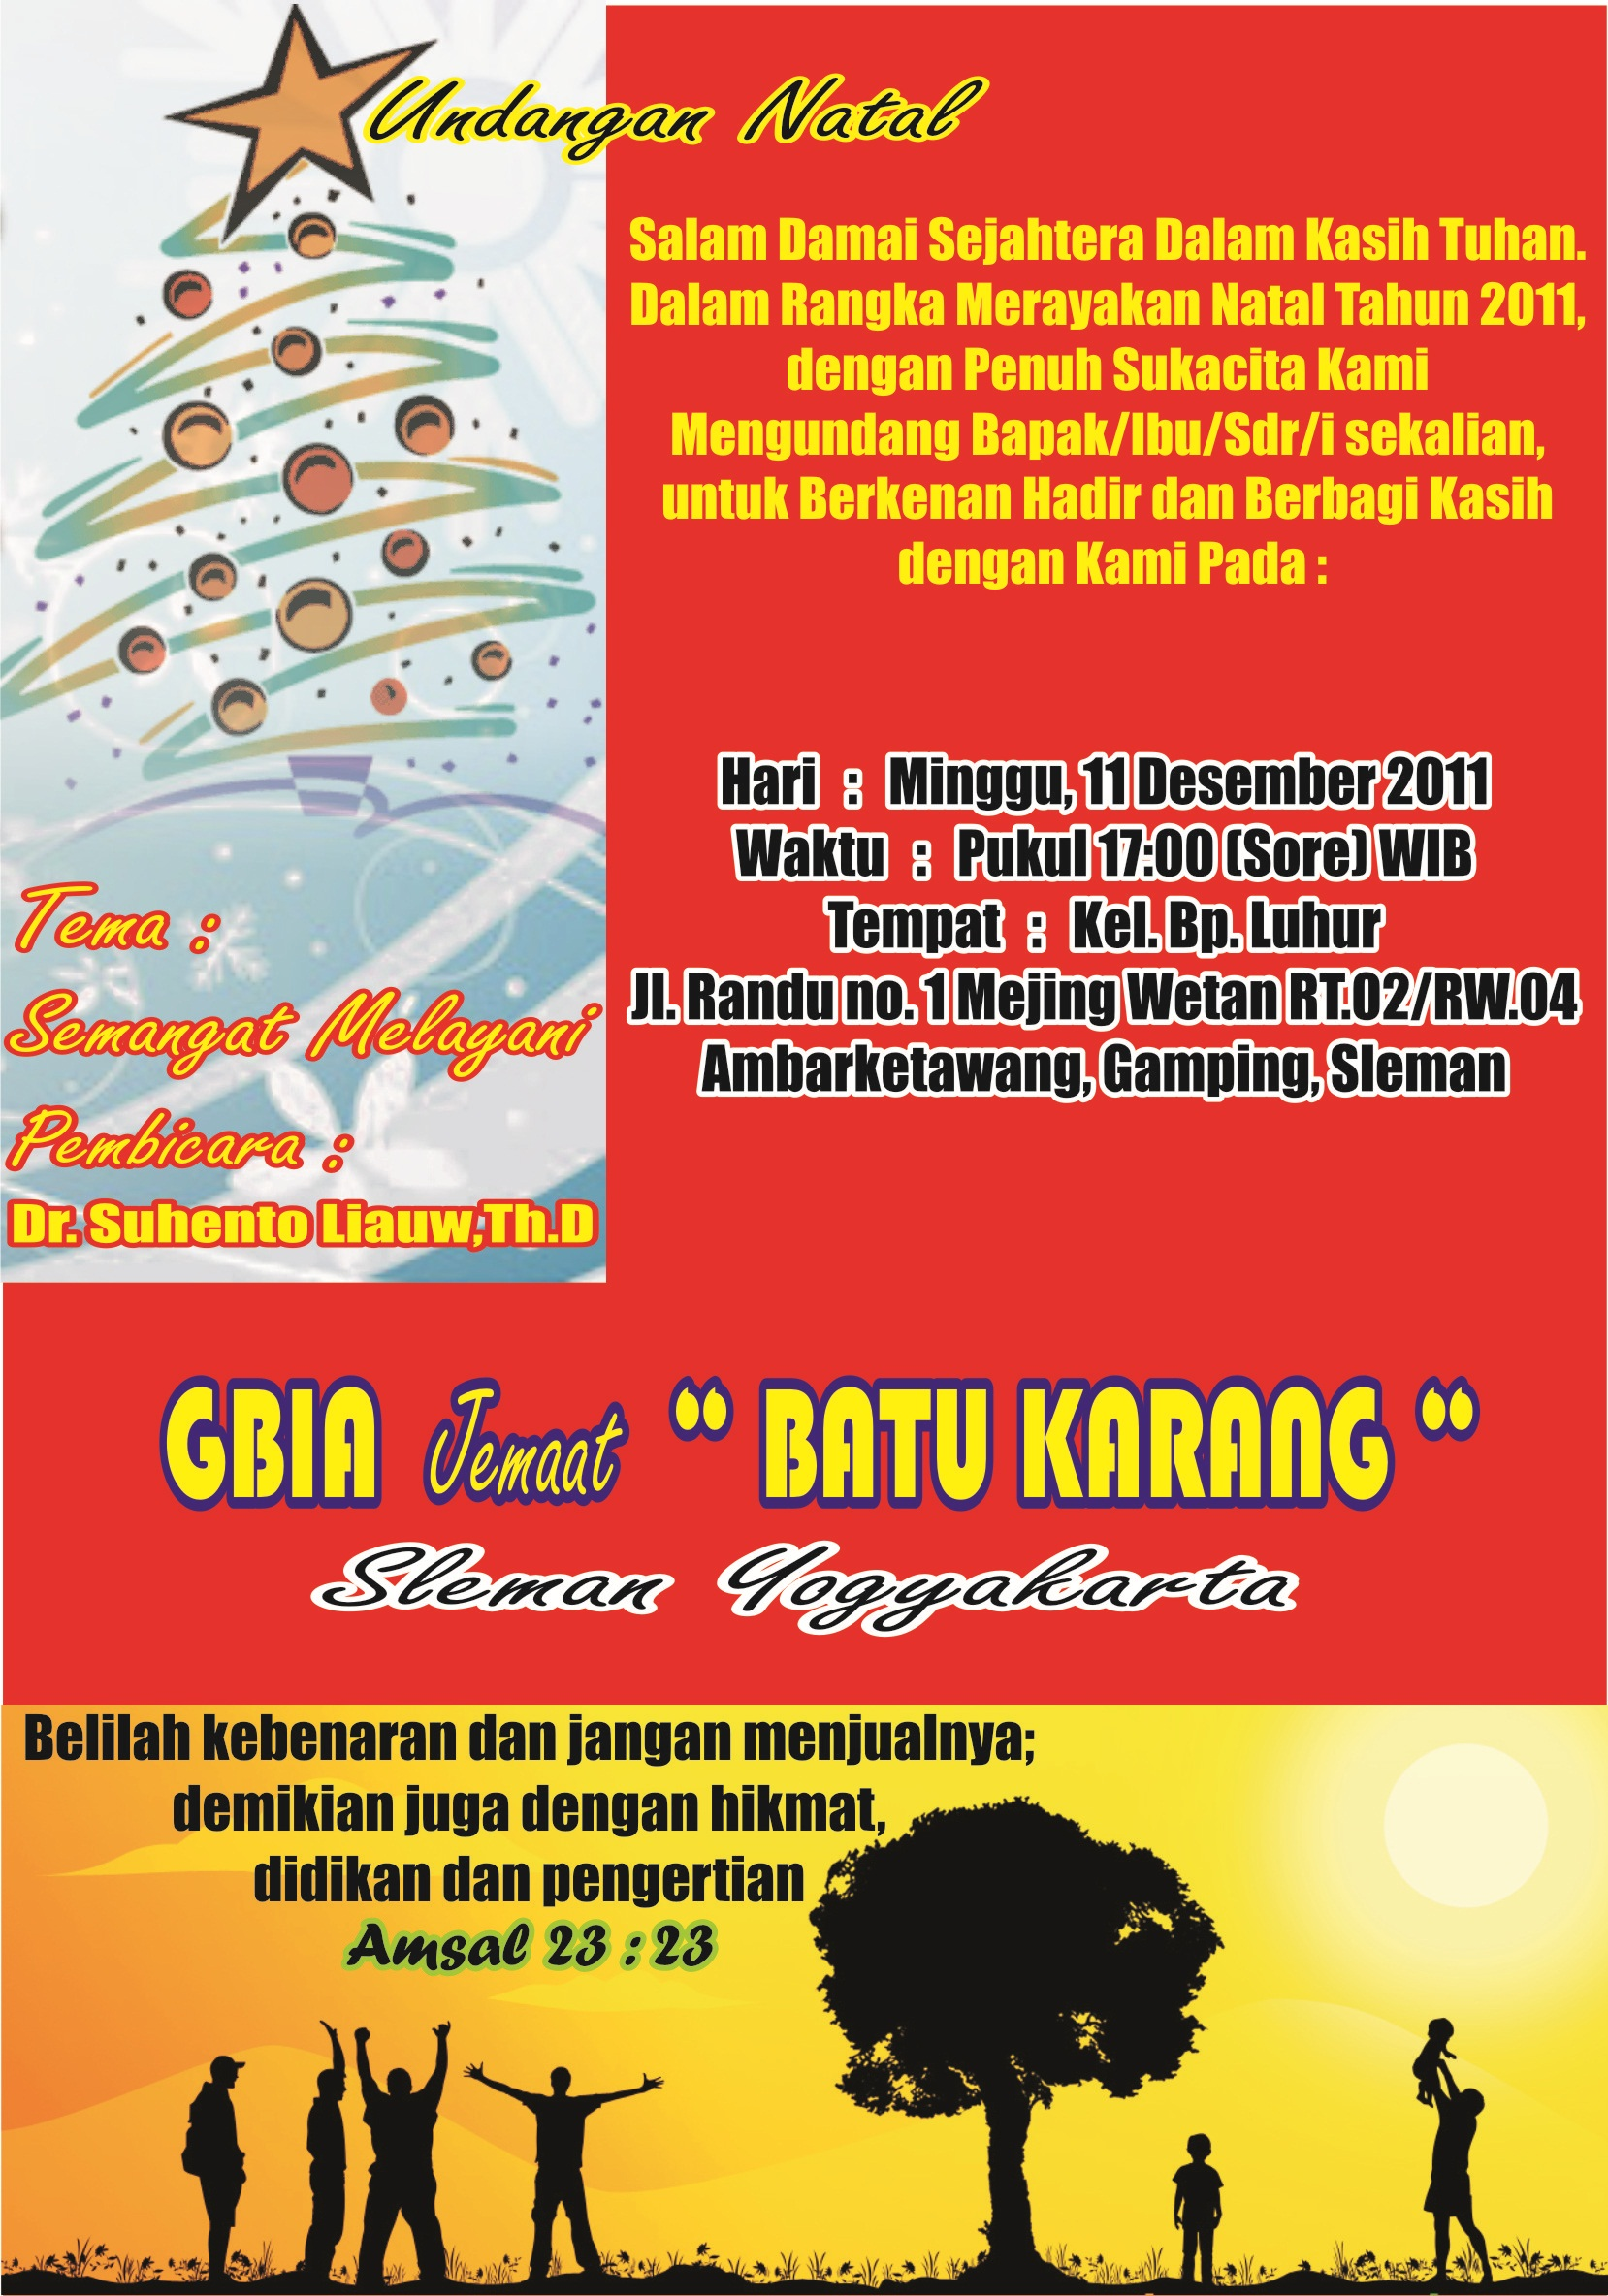 Undangan Natal | GBIA (Gereja Baptis Independen Alkitabiah